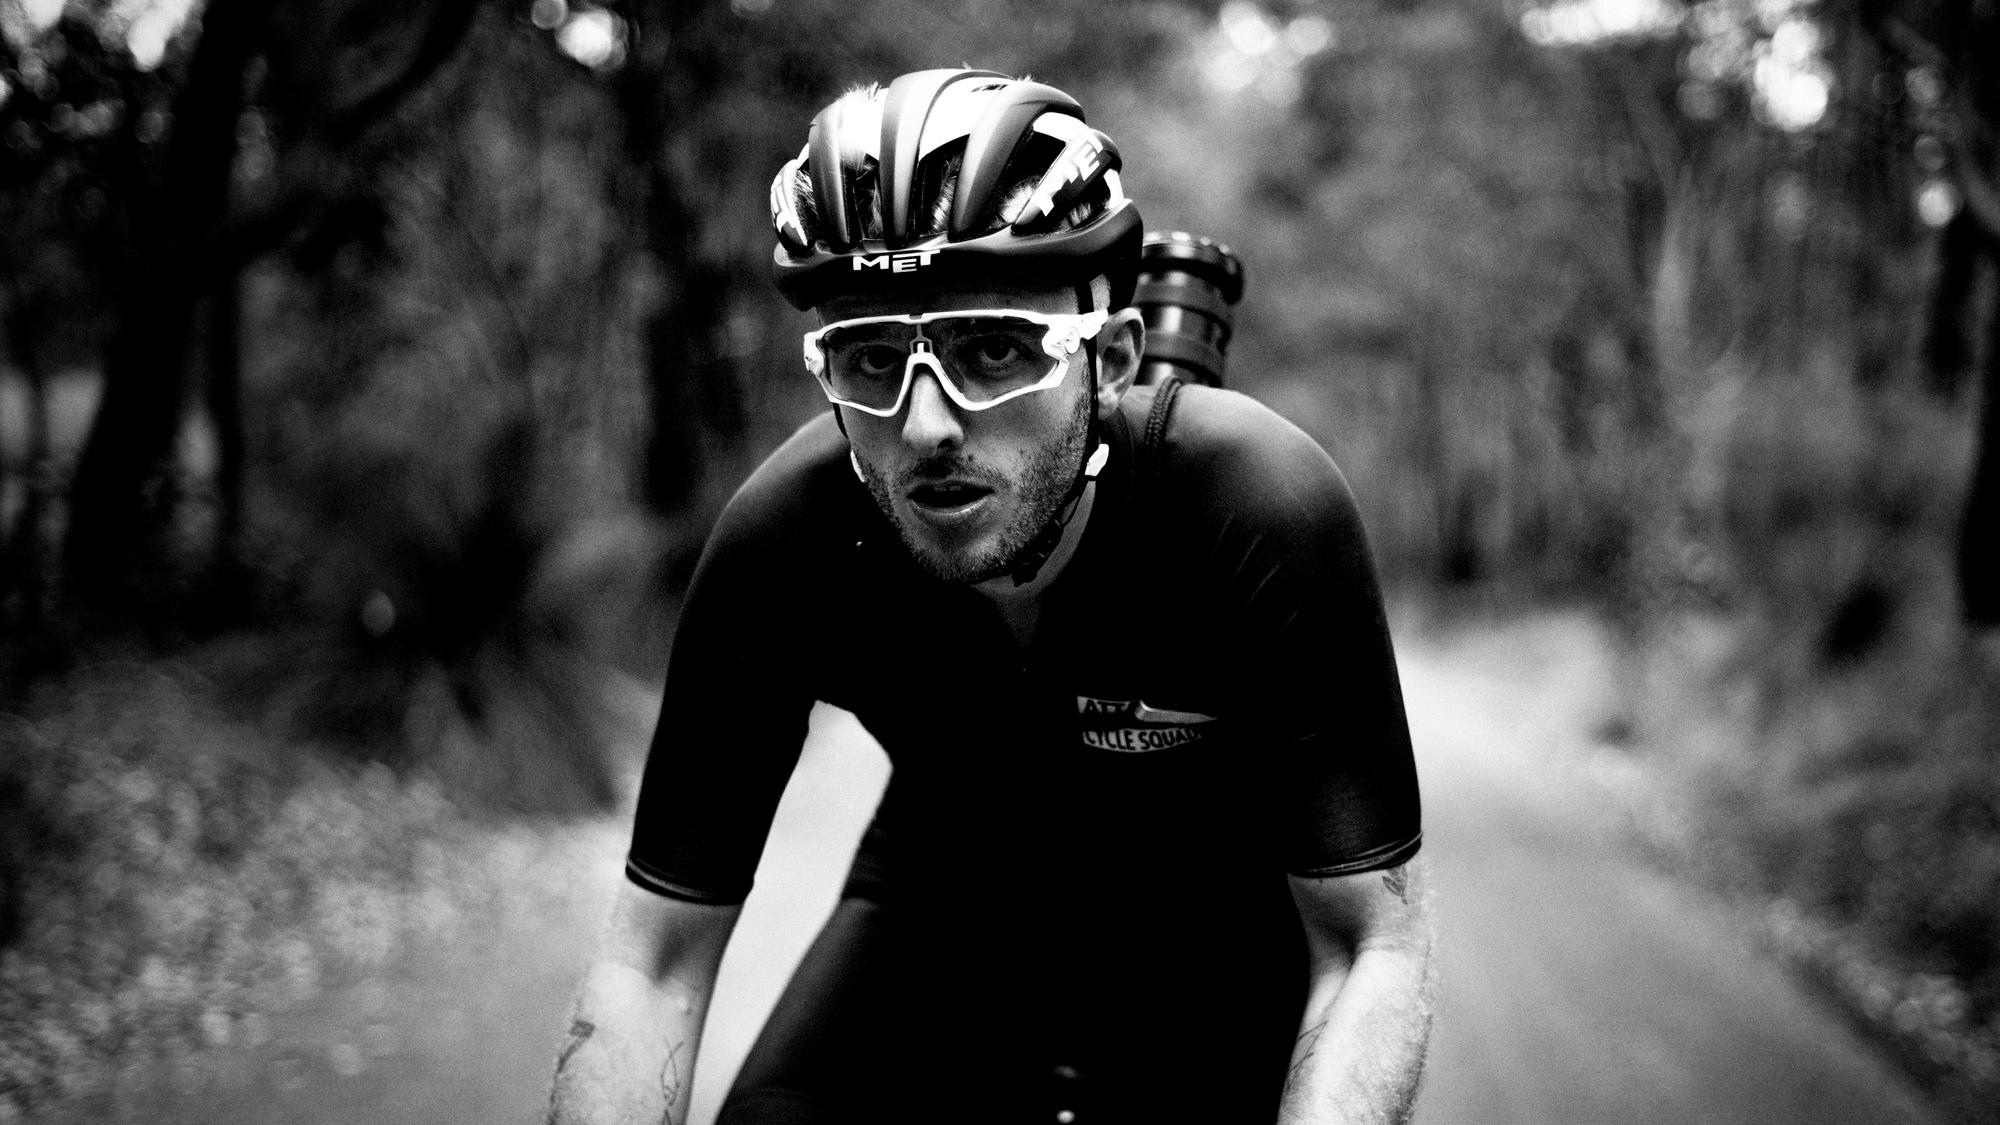 Francis Cade MET Helmets Trenta